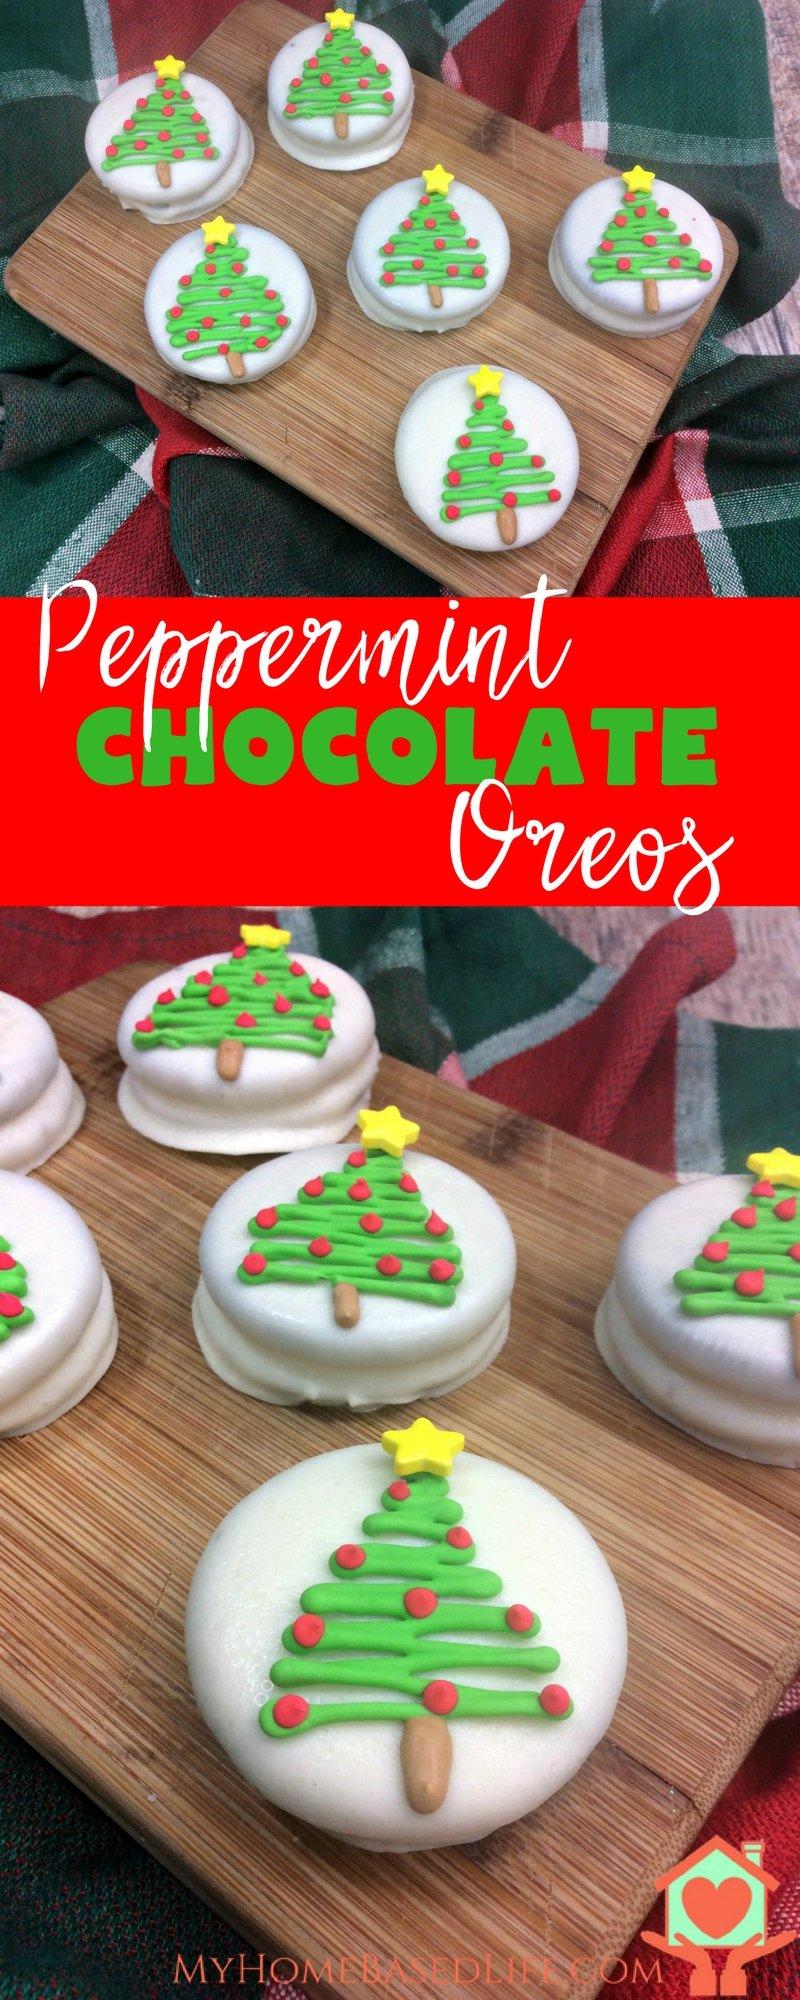 Peppermint Chocolate Oreos